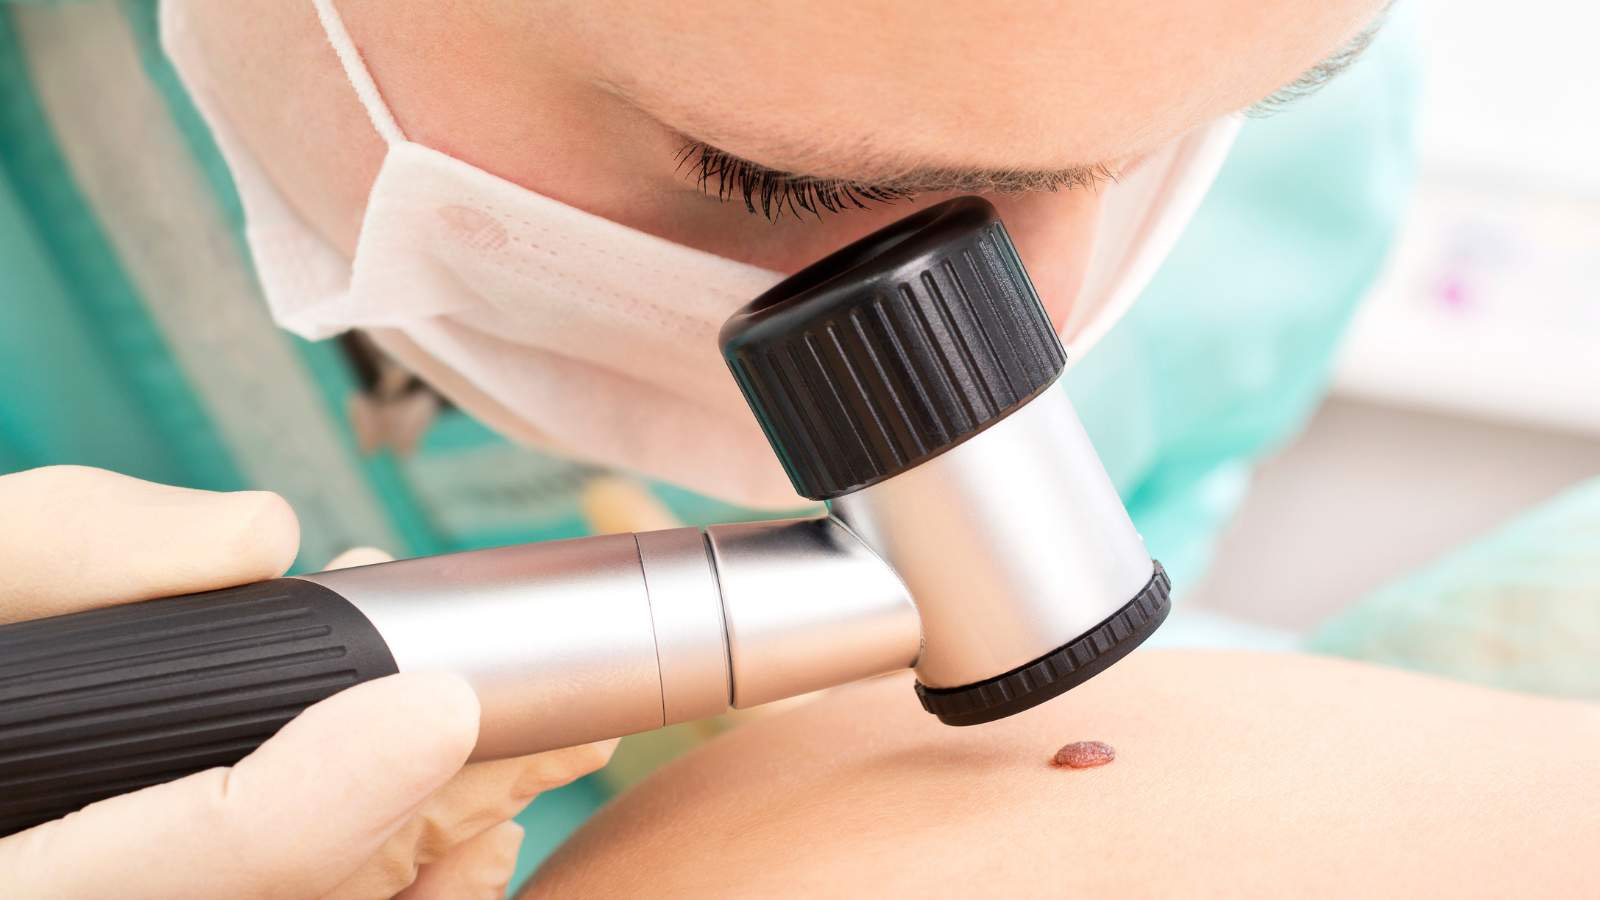 Dermatologist examining a patient